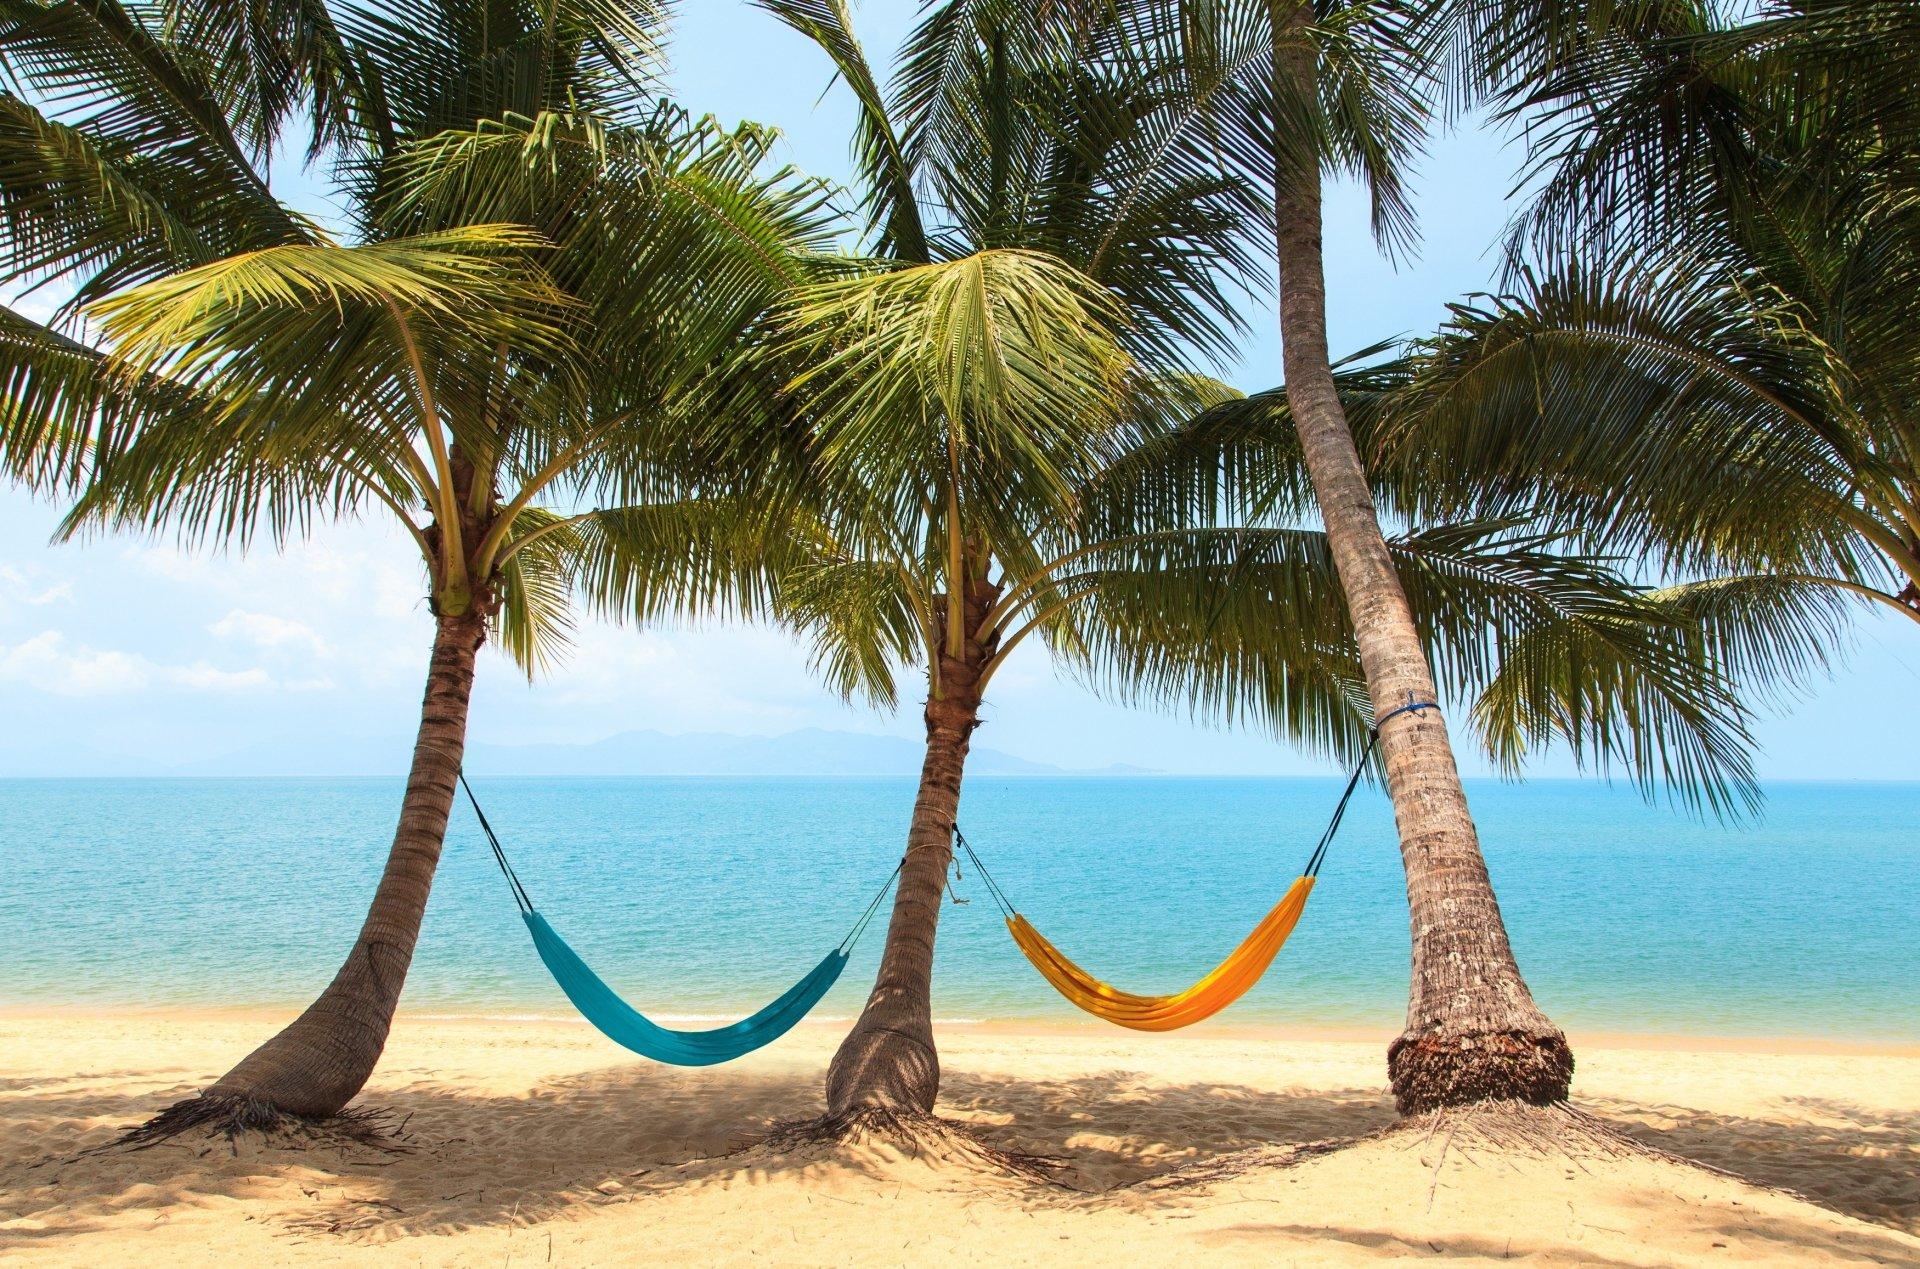 Construction Humaine - Hammock Tropics Palmier Plage Vacances Resting ...